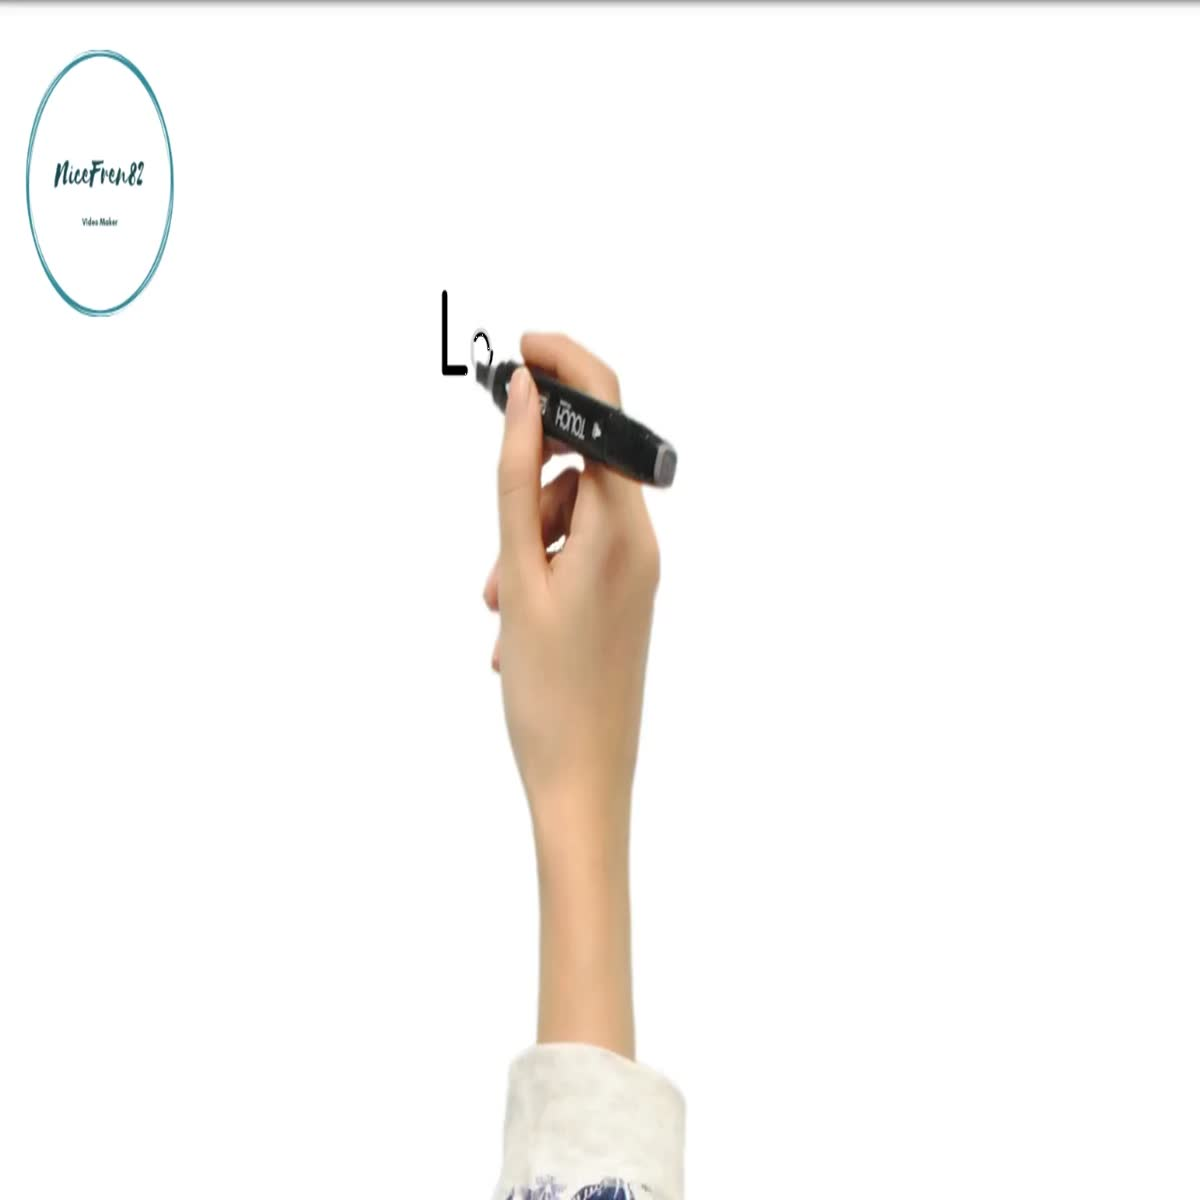 Doodle Explainer Whiteboard Animation Video